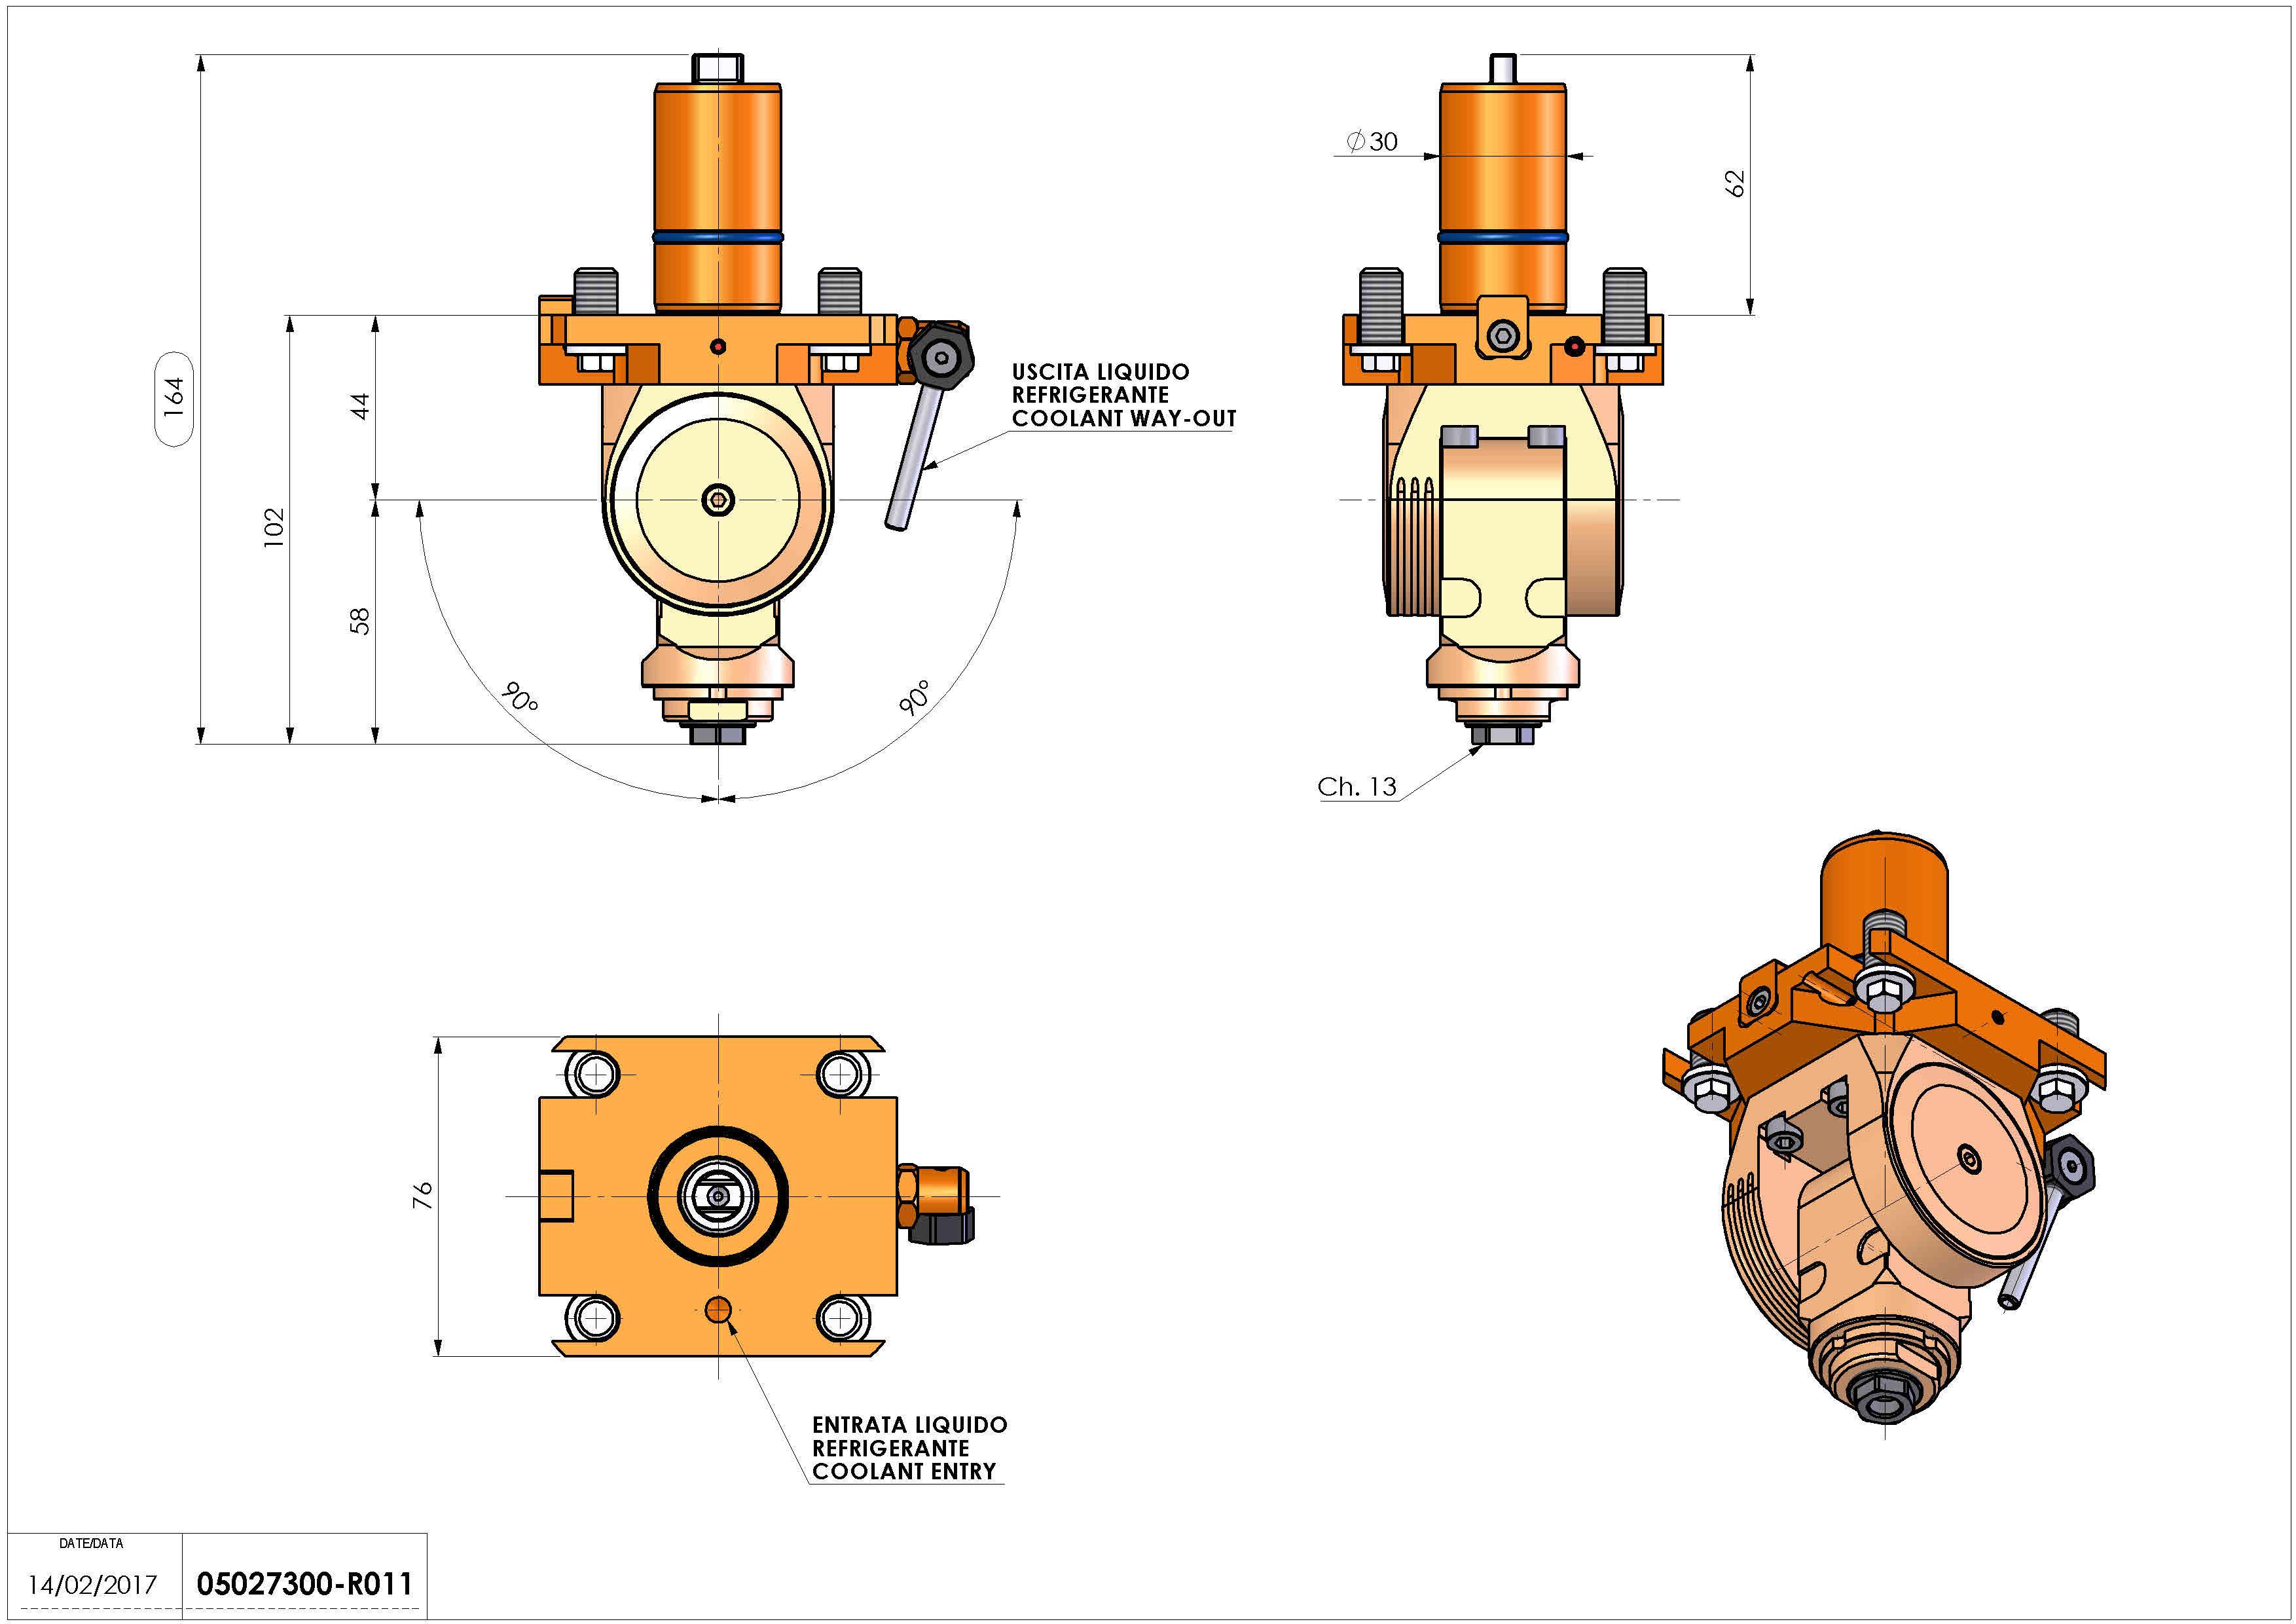 Technical image - LT-T D30 ER11F H44-102 TZ.